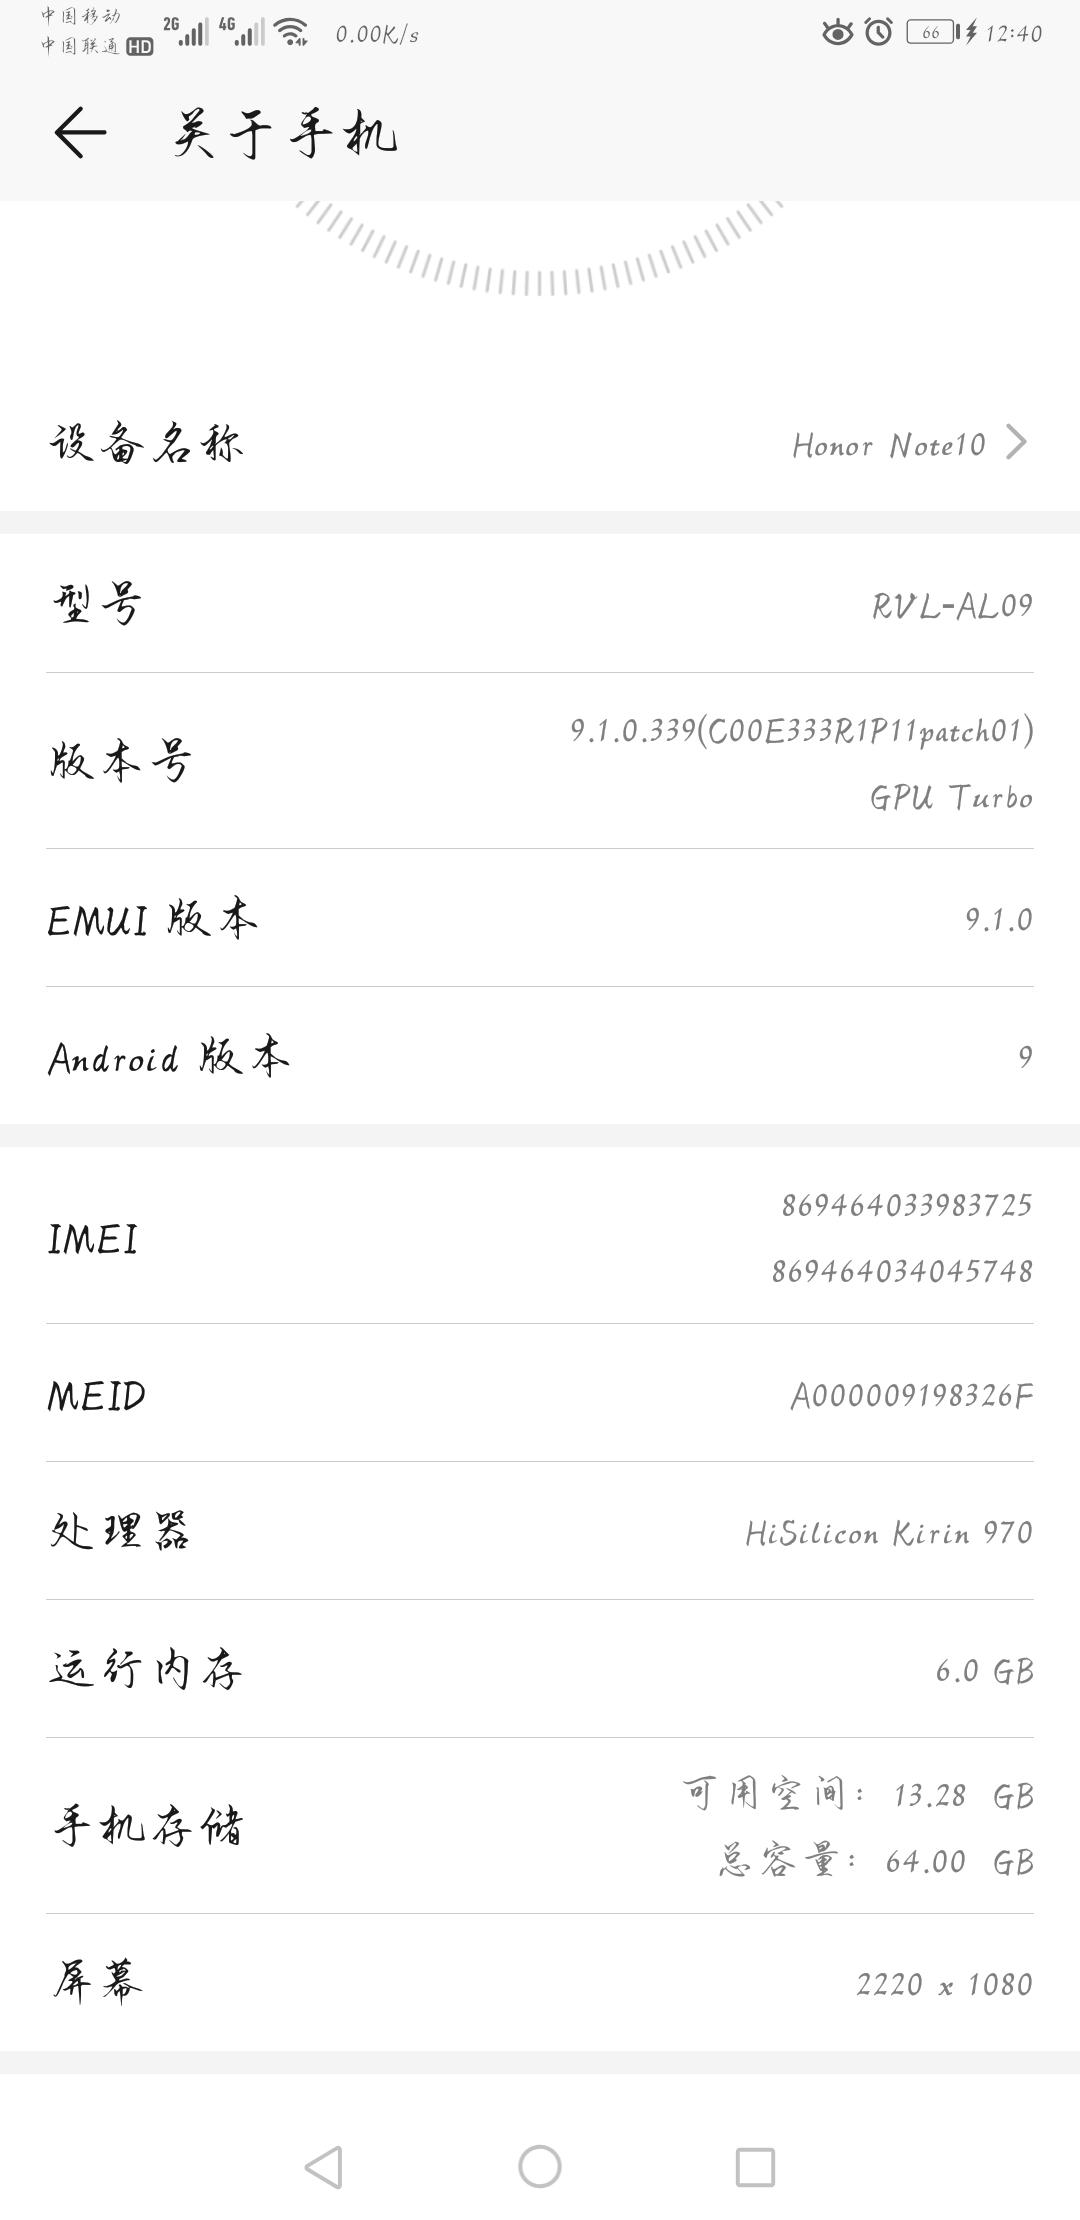 Screenshot_20210524_124040_com.android.settings.jpg